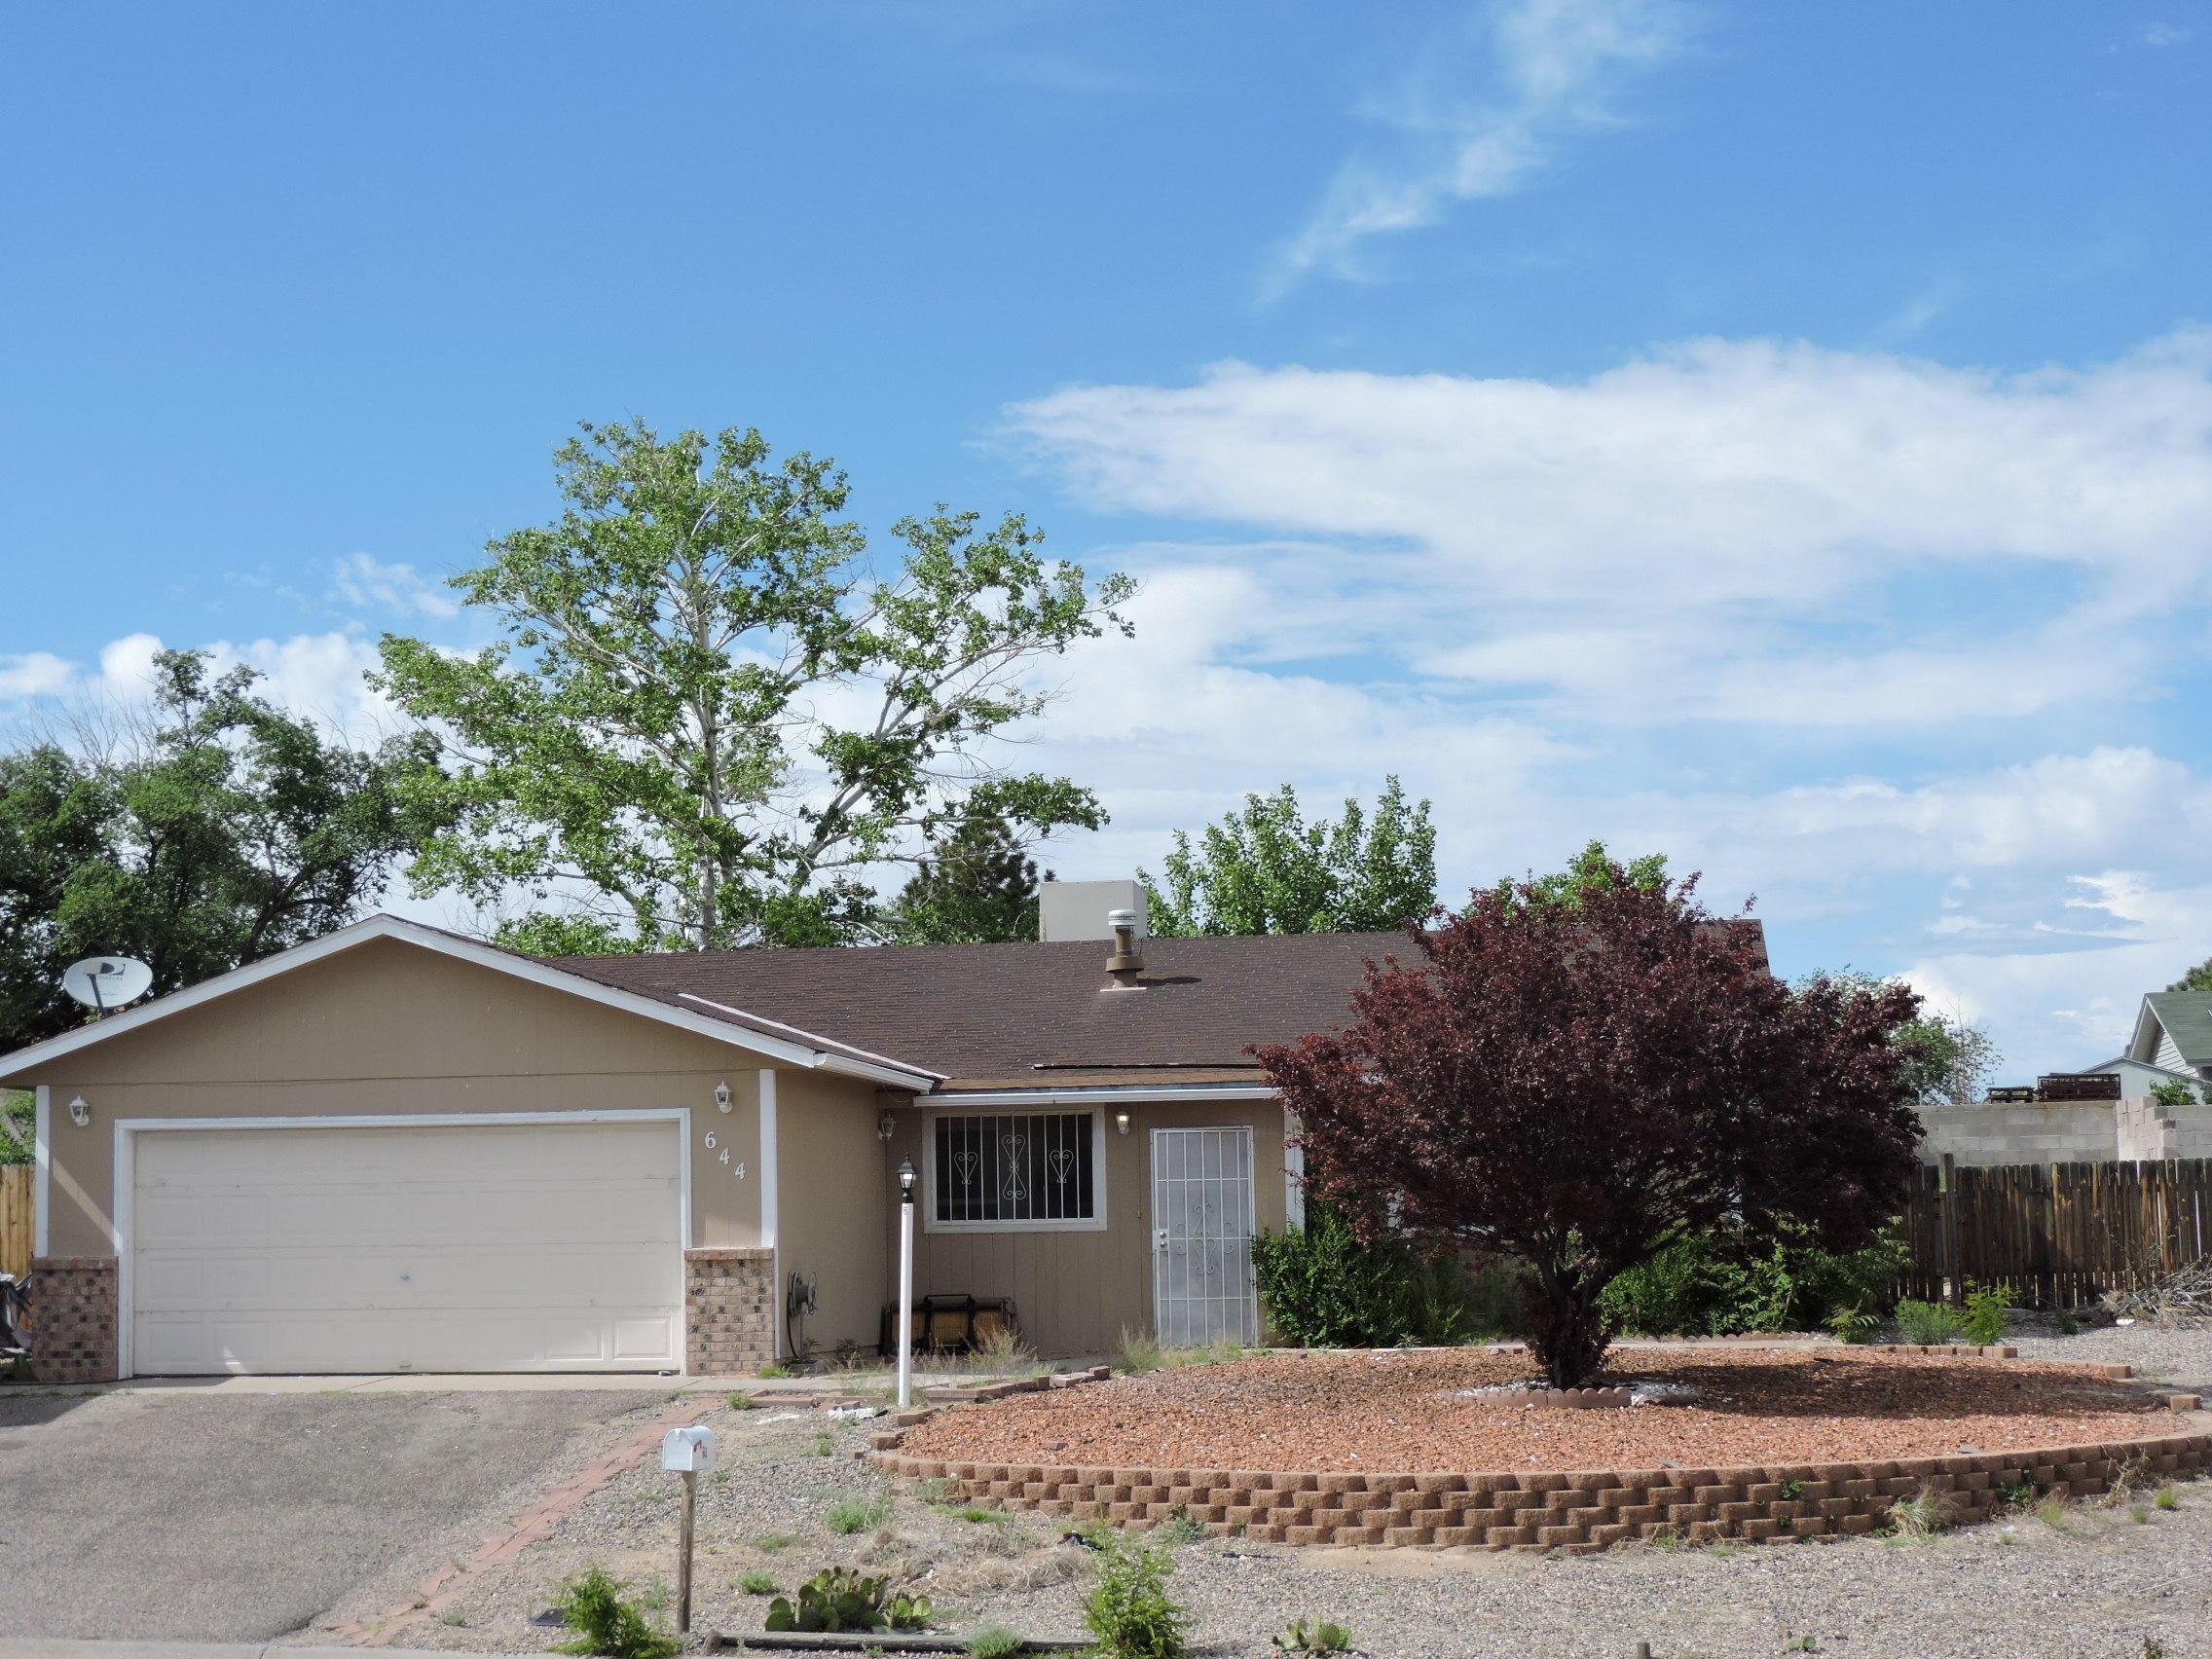 644 SE Hood Road, Rio Rancho, New Mexico